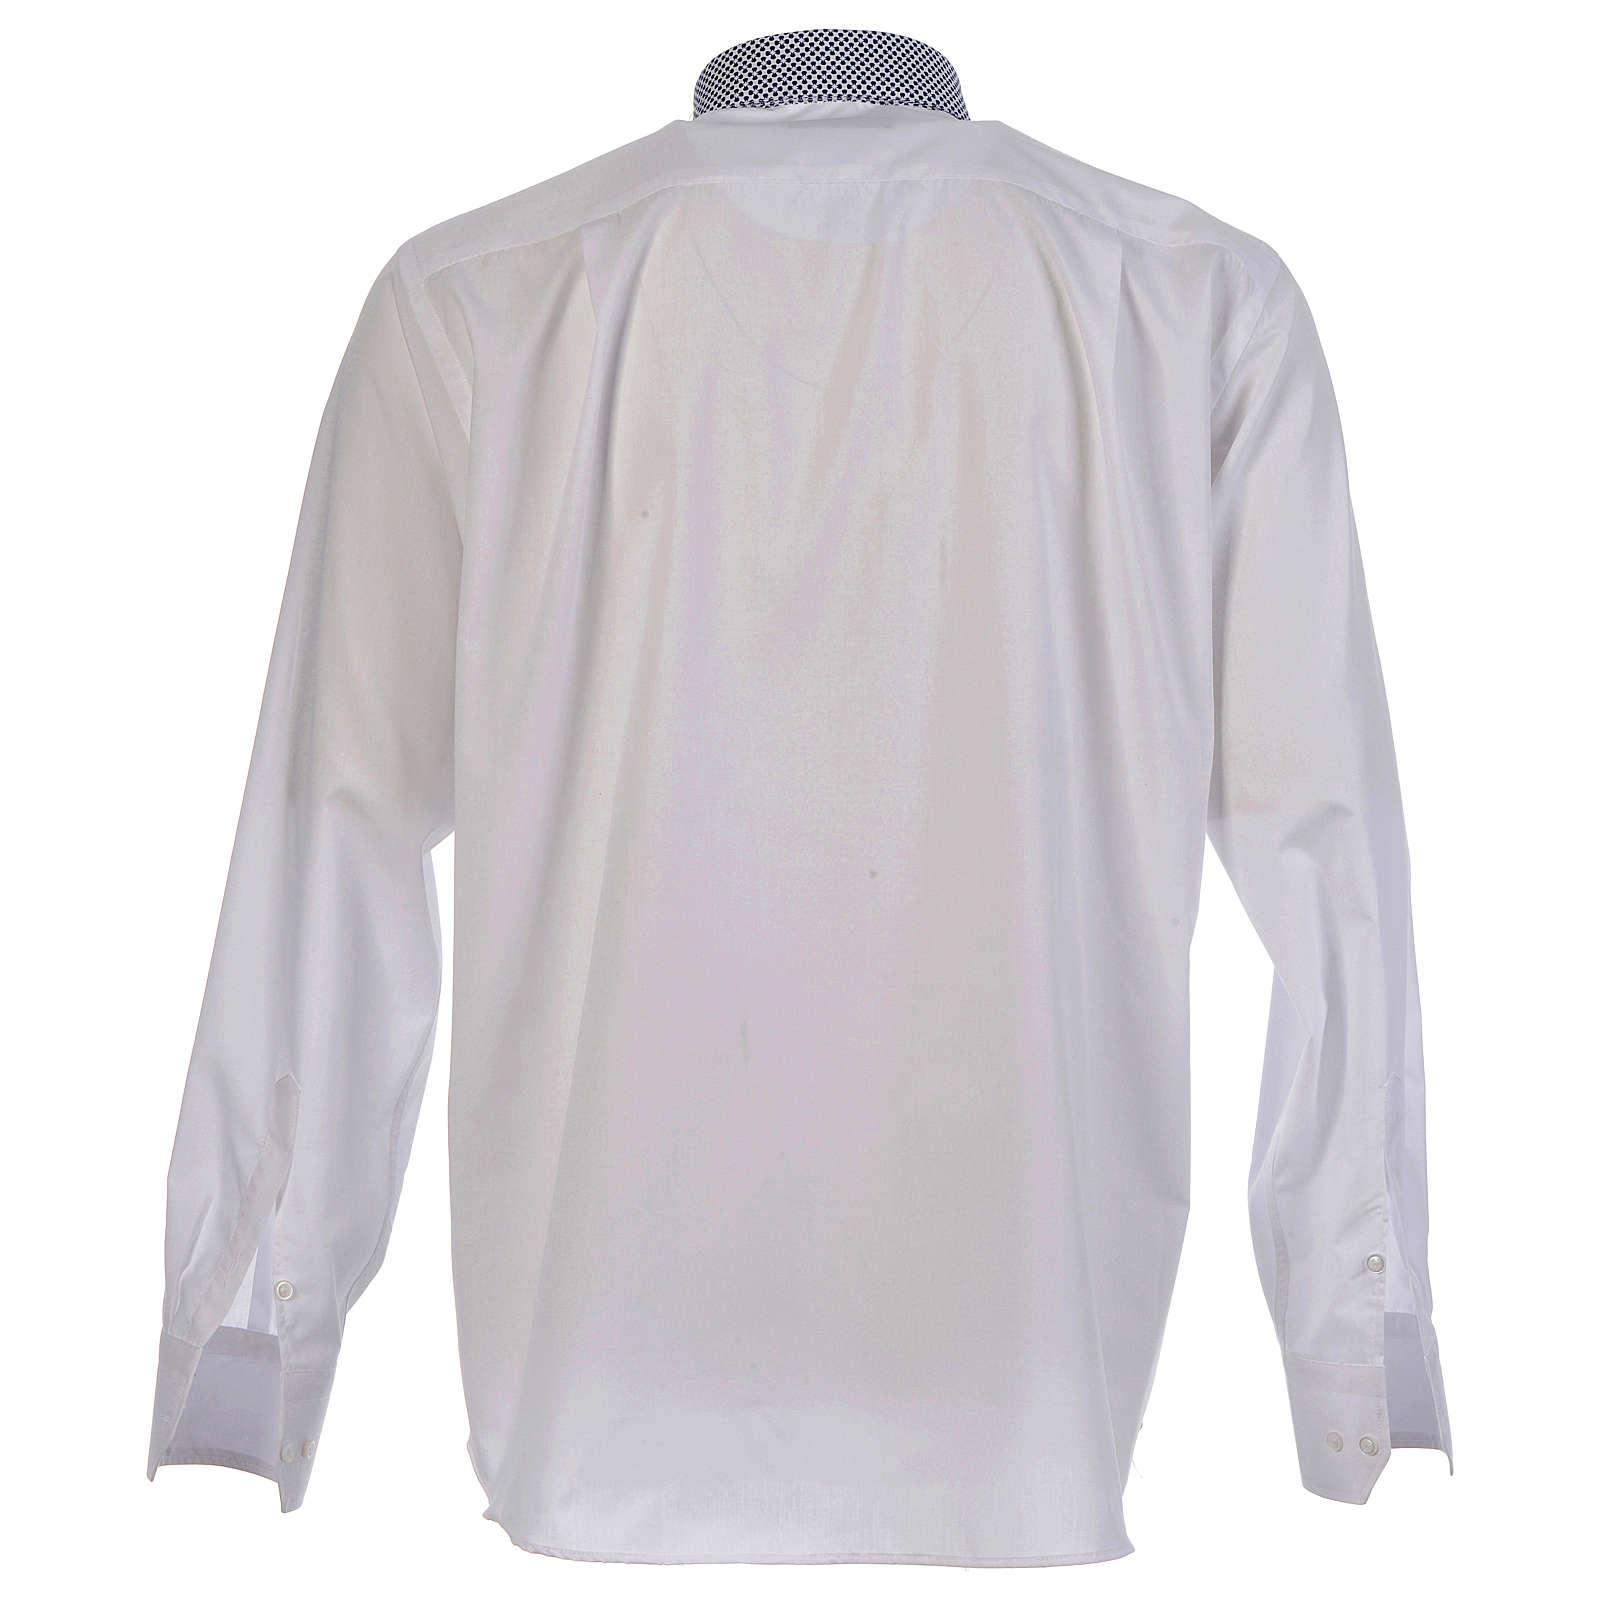 Chemise clergy contraste croix blanc manches longues 4